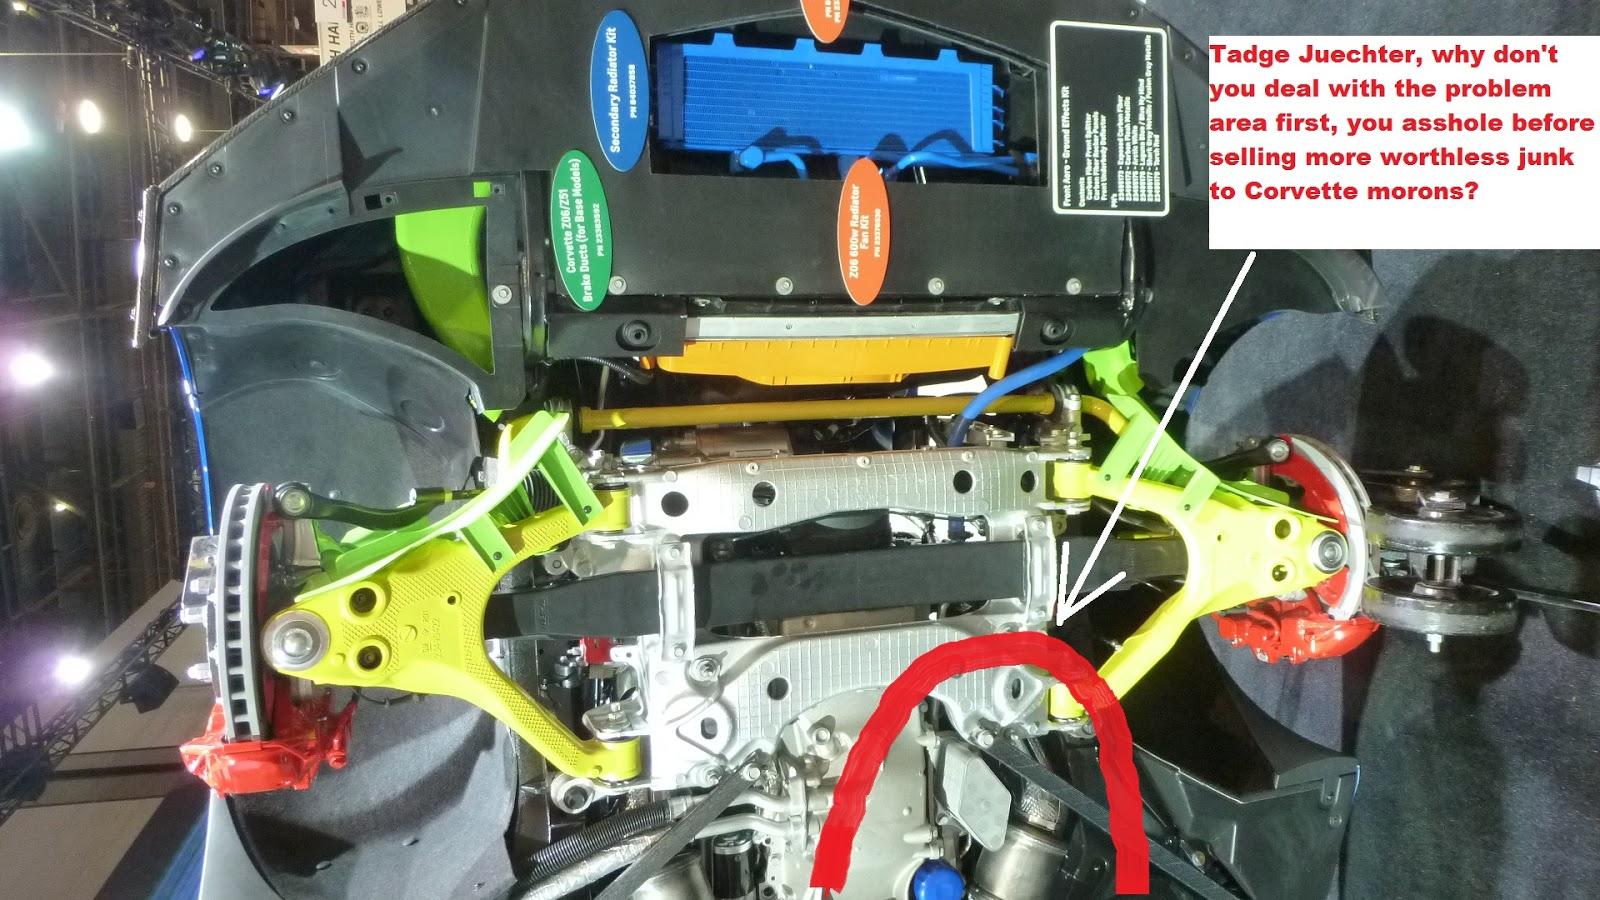 PeterMJ's Corvette C7 Stingray and Z06 Exposed: 2015